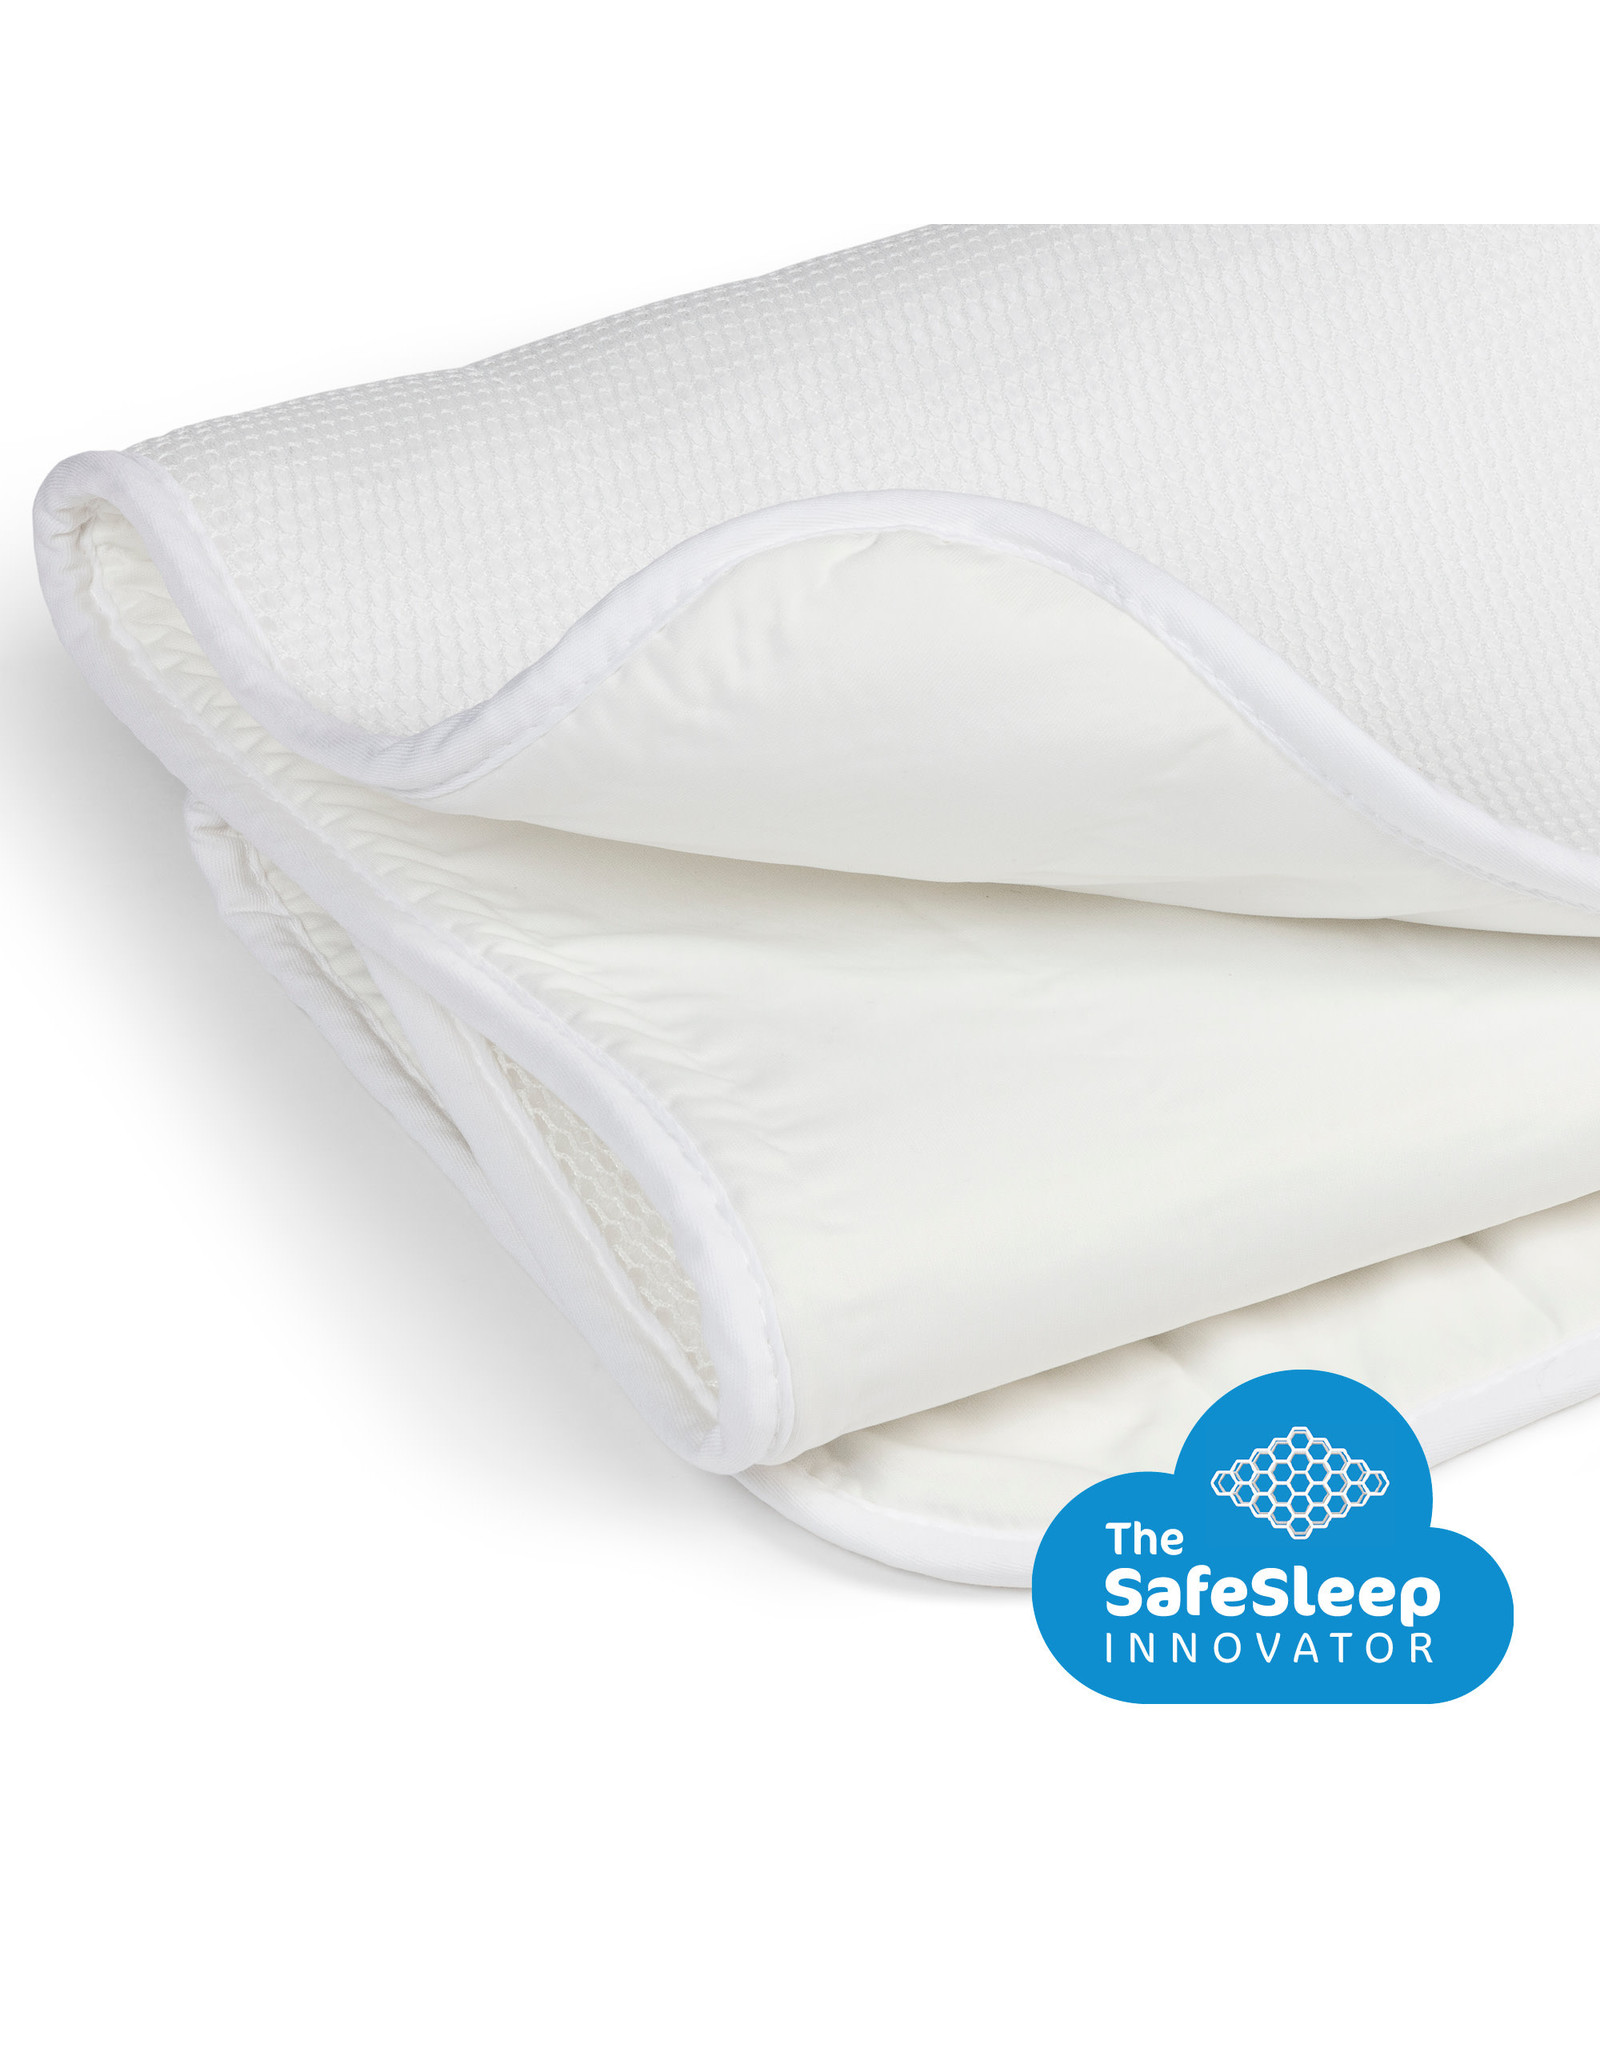 Aerosleep Aerosleep Sleep Safe Matress Protector